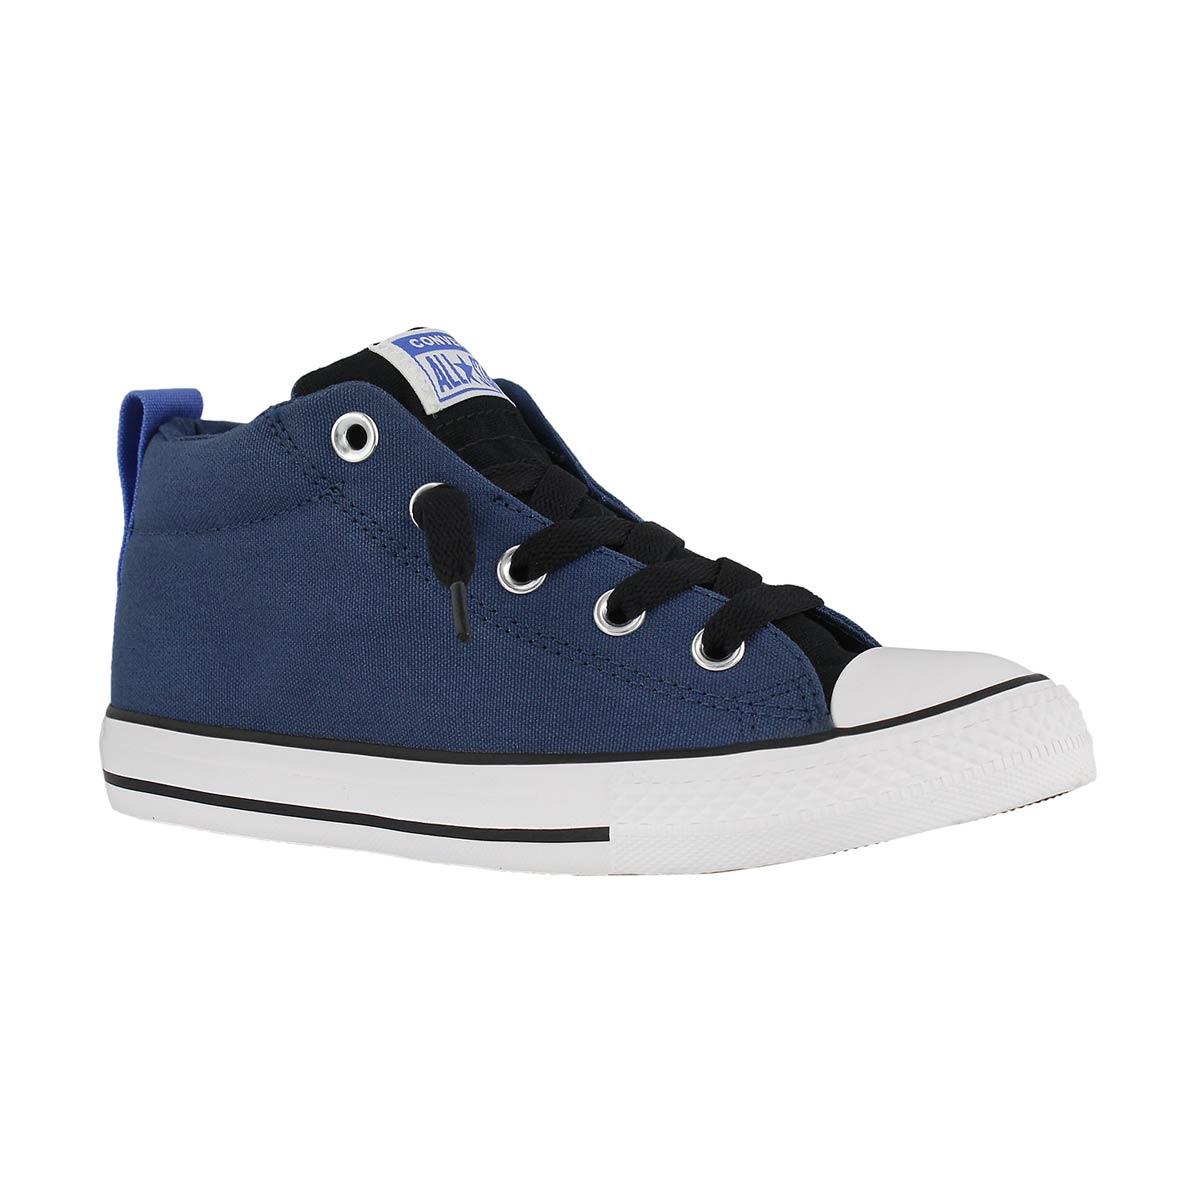 Boys' CT ALL STAR STREET mason blue sneakers